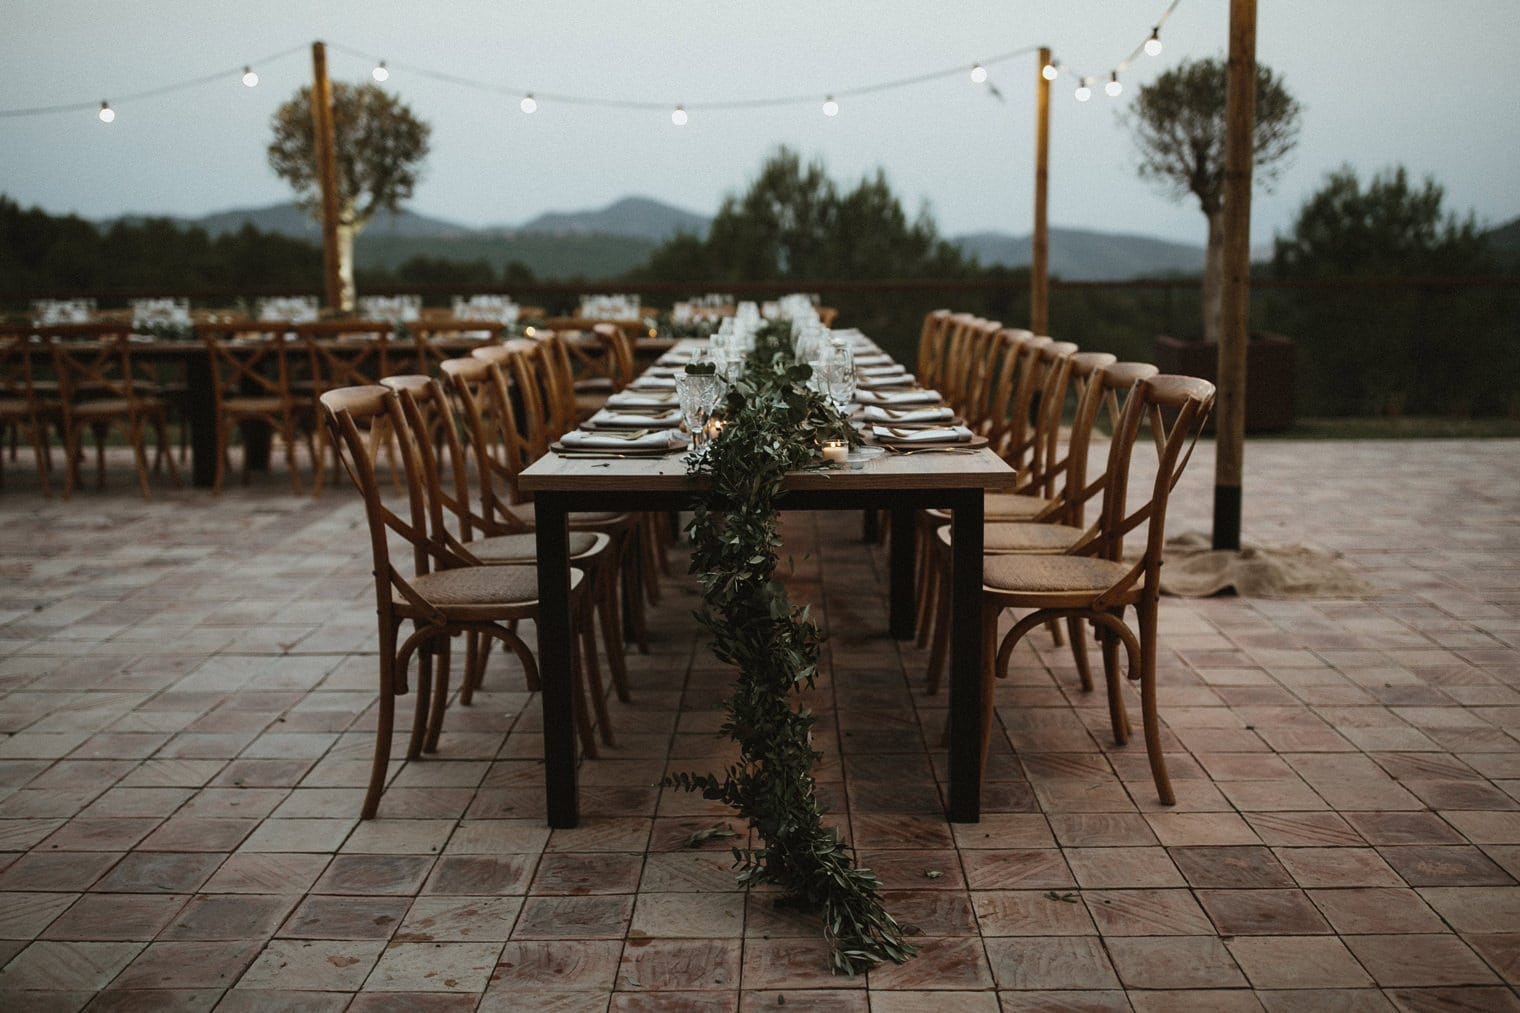 Outdoor wedding reception decor under festoon lighting in spain